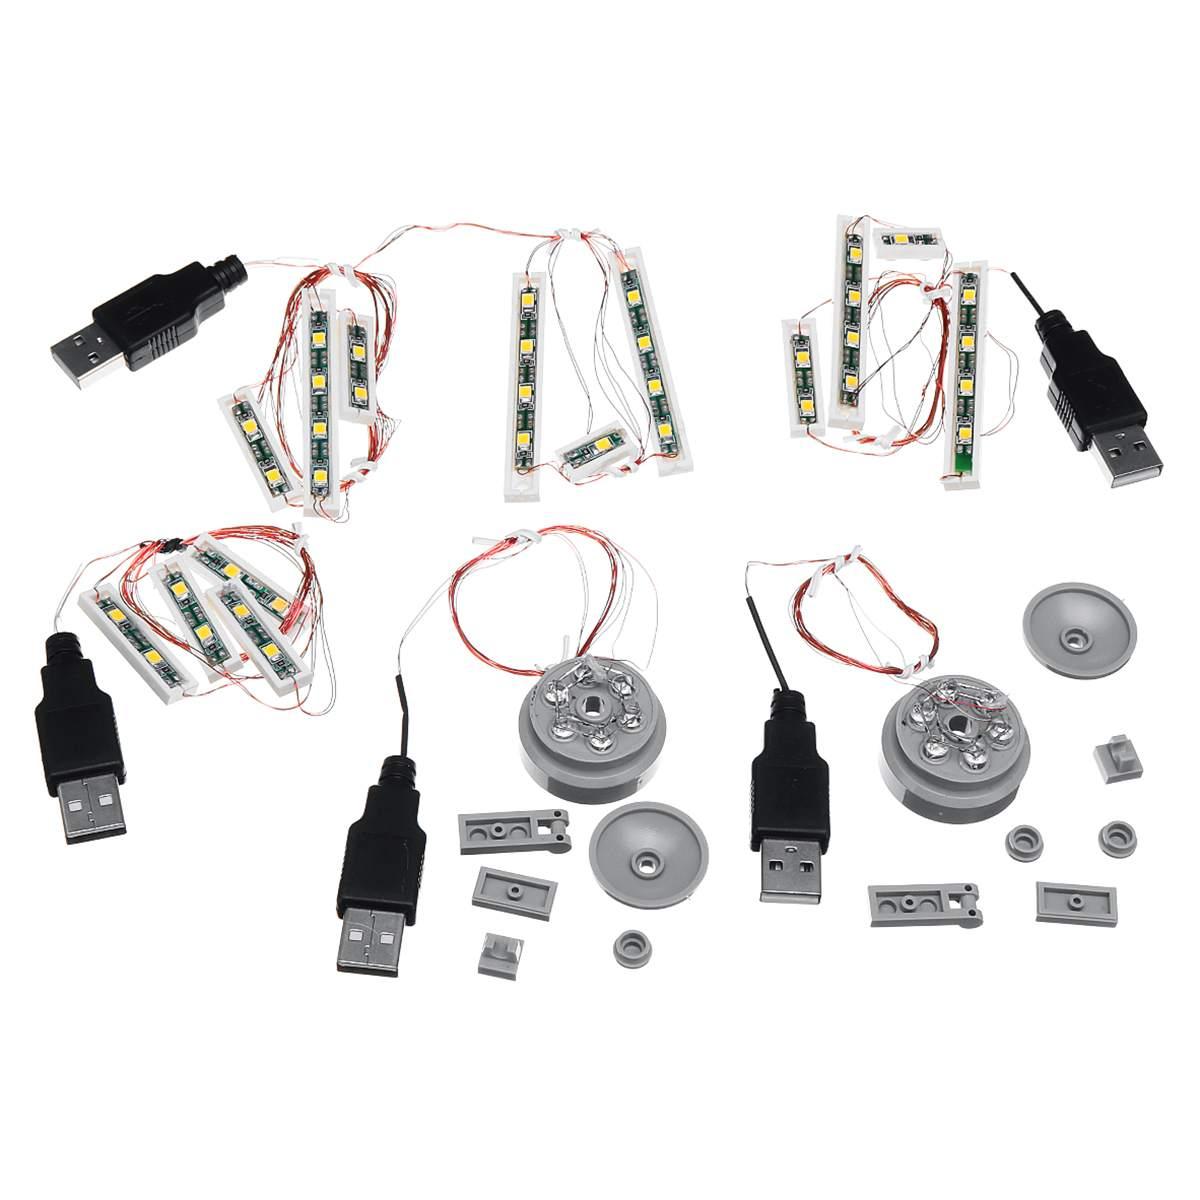 Universal 4 LED Round Light Lighting Lamp Kit For Lego Toy Bricks USB Port !